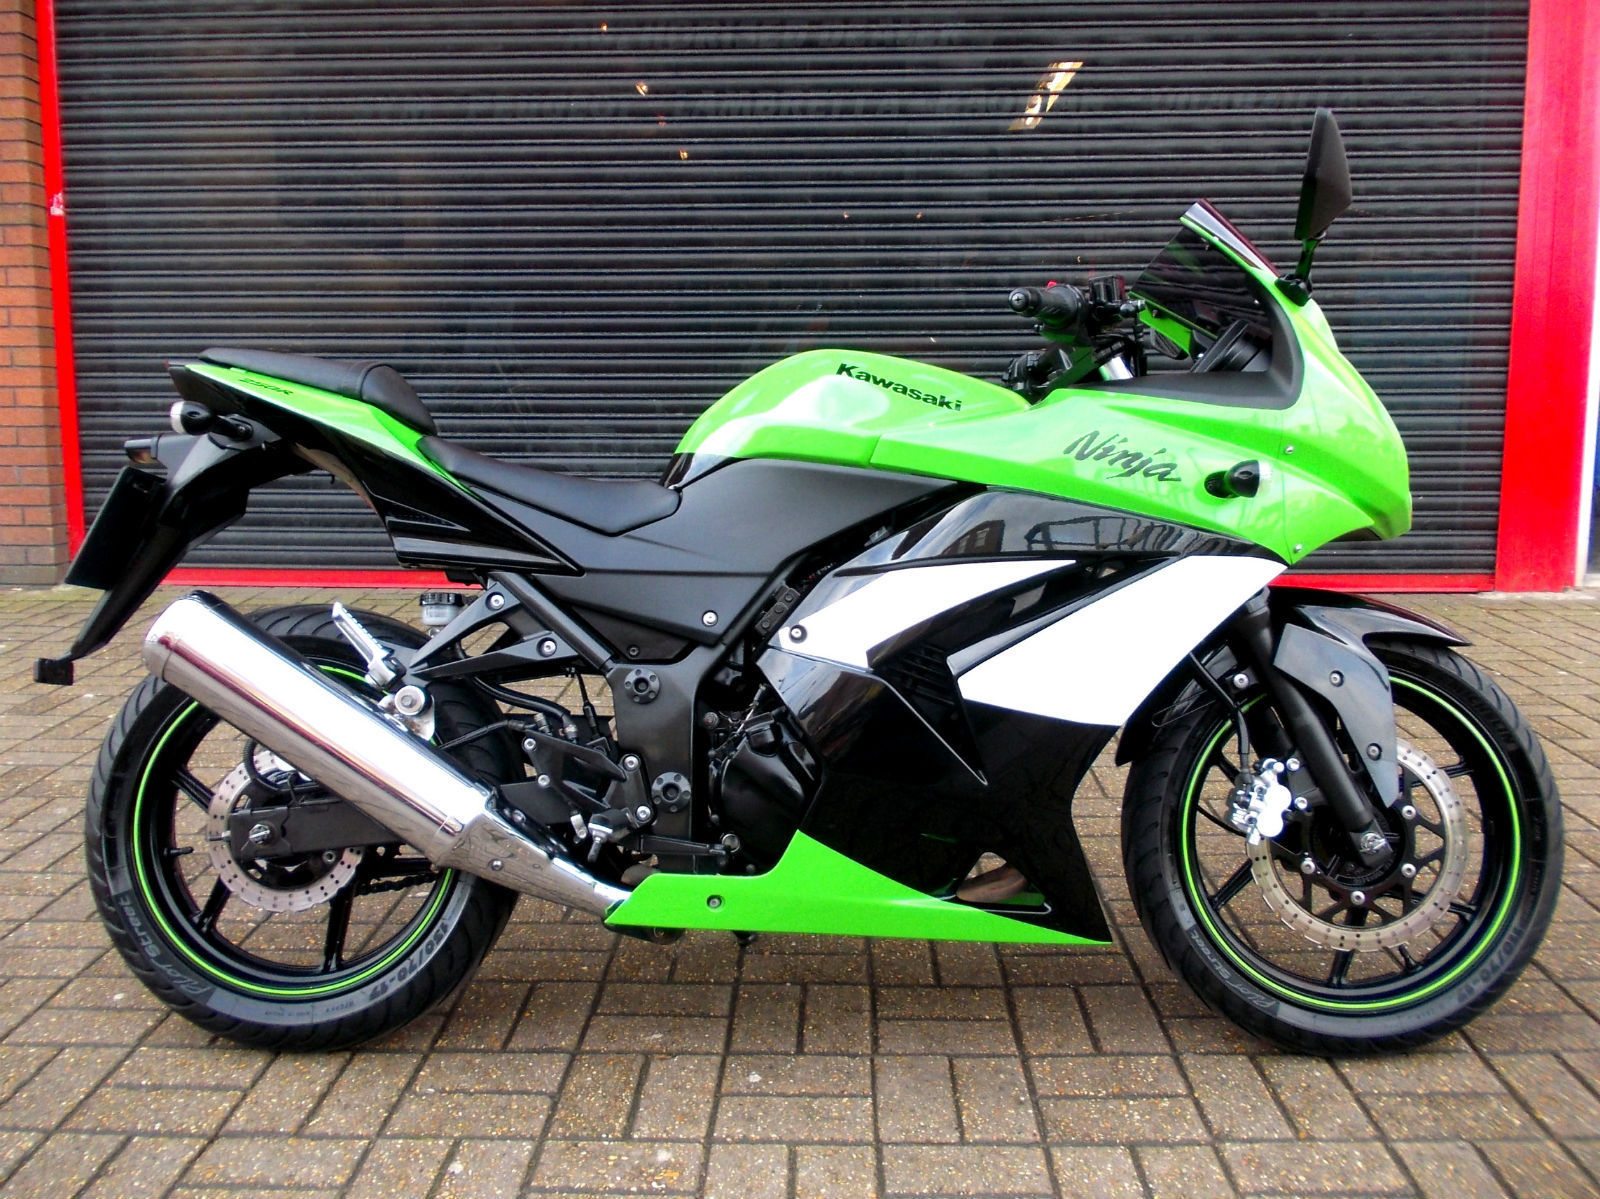 Kawasaki Ninja 250r 2009 характеристики #6